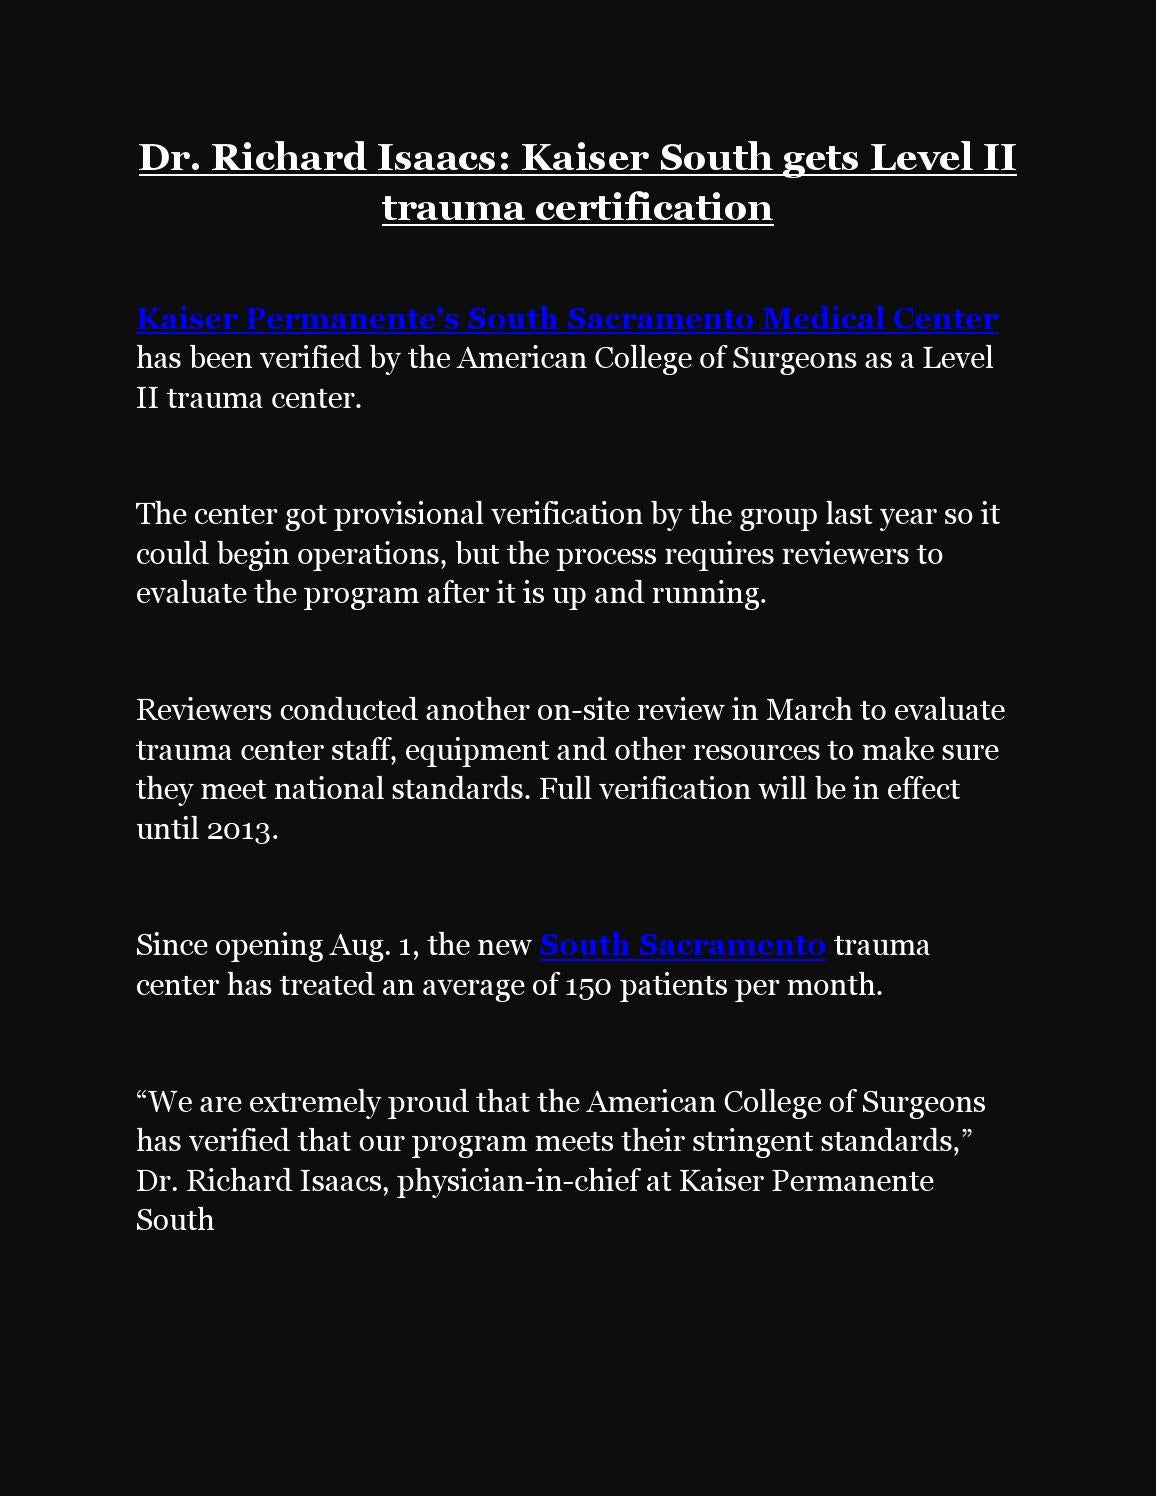 Dr richard isaacs kaiser south gets level ii trauma certification dr richard isaacs kaiser south gets level ii trauma certification by bailey williams issuu xflitez Images